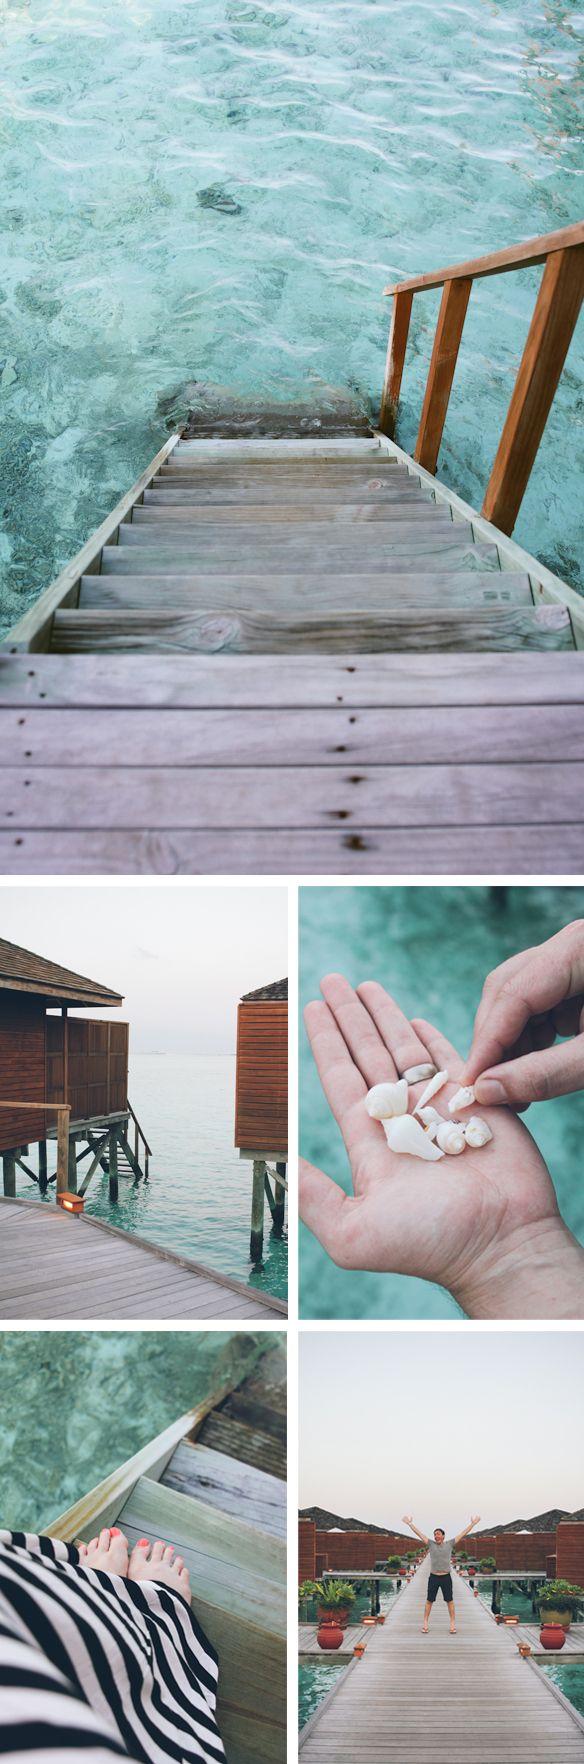 meeru island resort  maldives    The Honeymoon Part 1 | fellowfellow